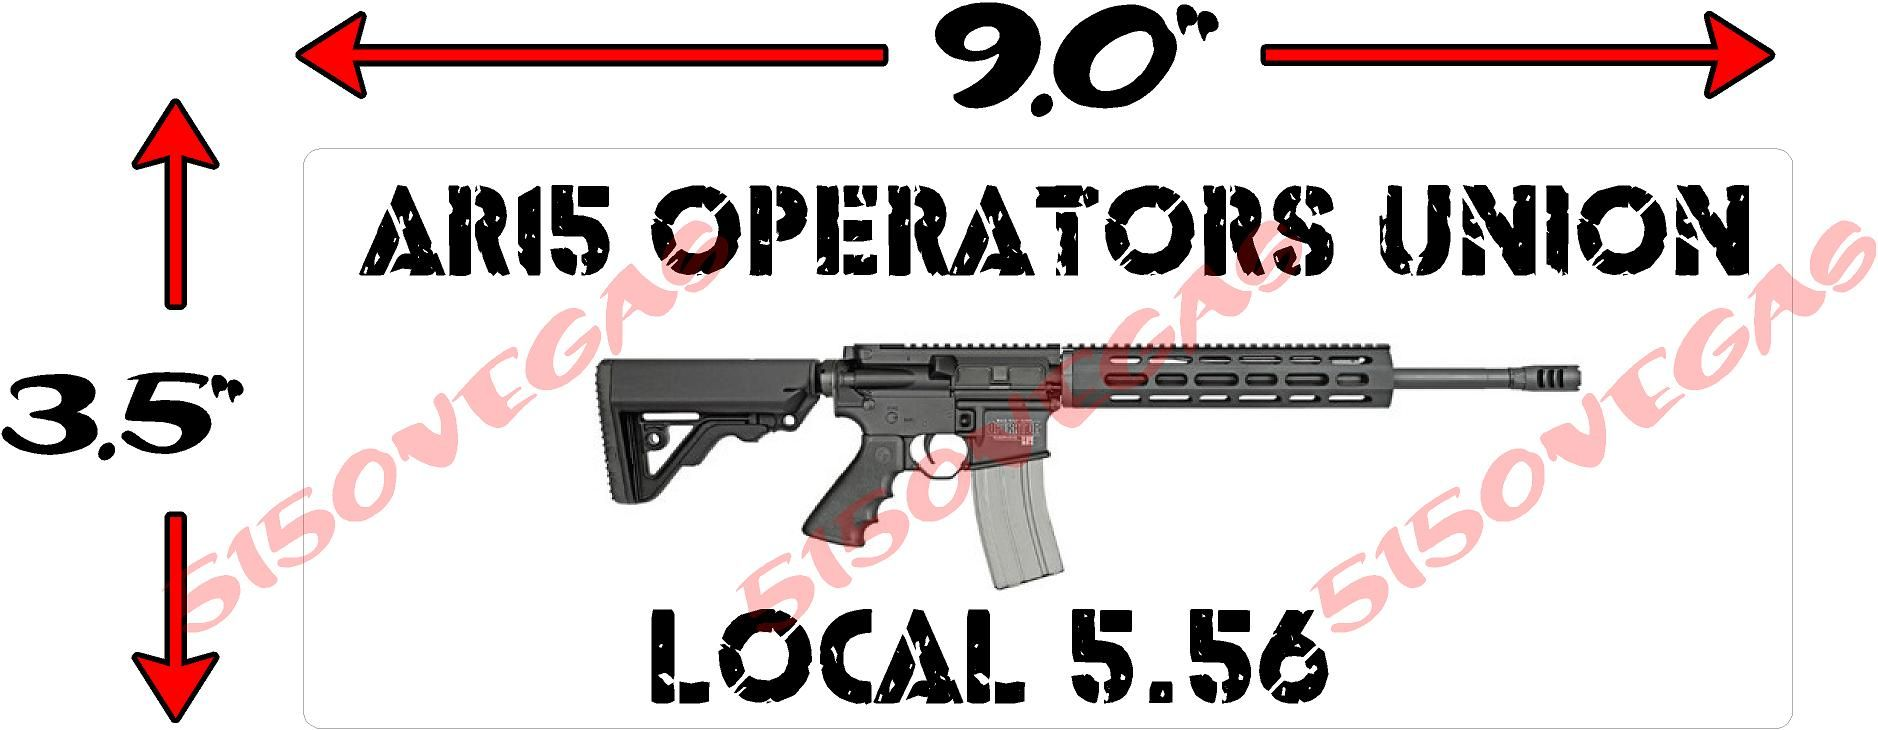 AR Operators Union Local Decal Sticker Gun Decals - Custom gun barrel stickersgun decals shotgun barrel sticker shooting ammo decal